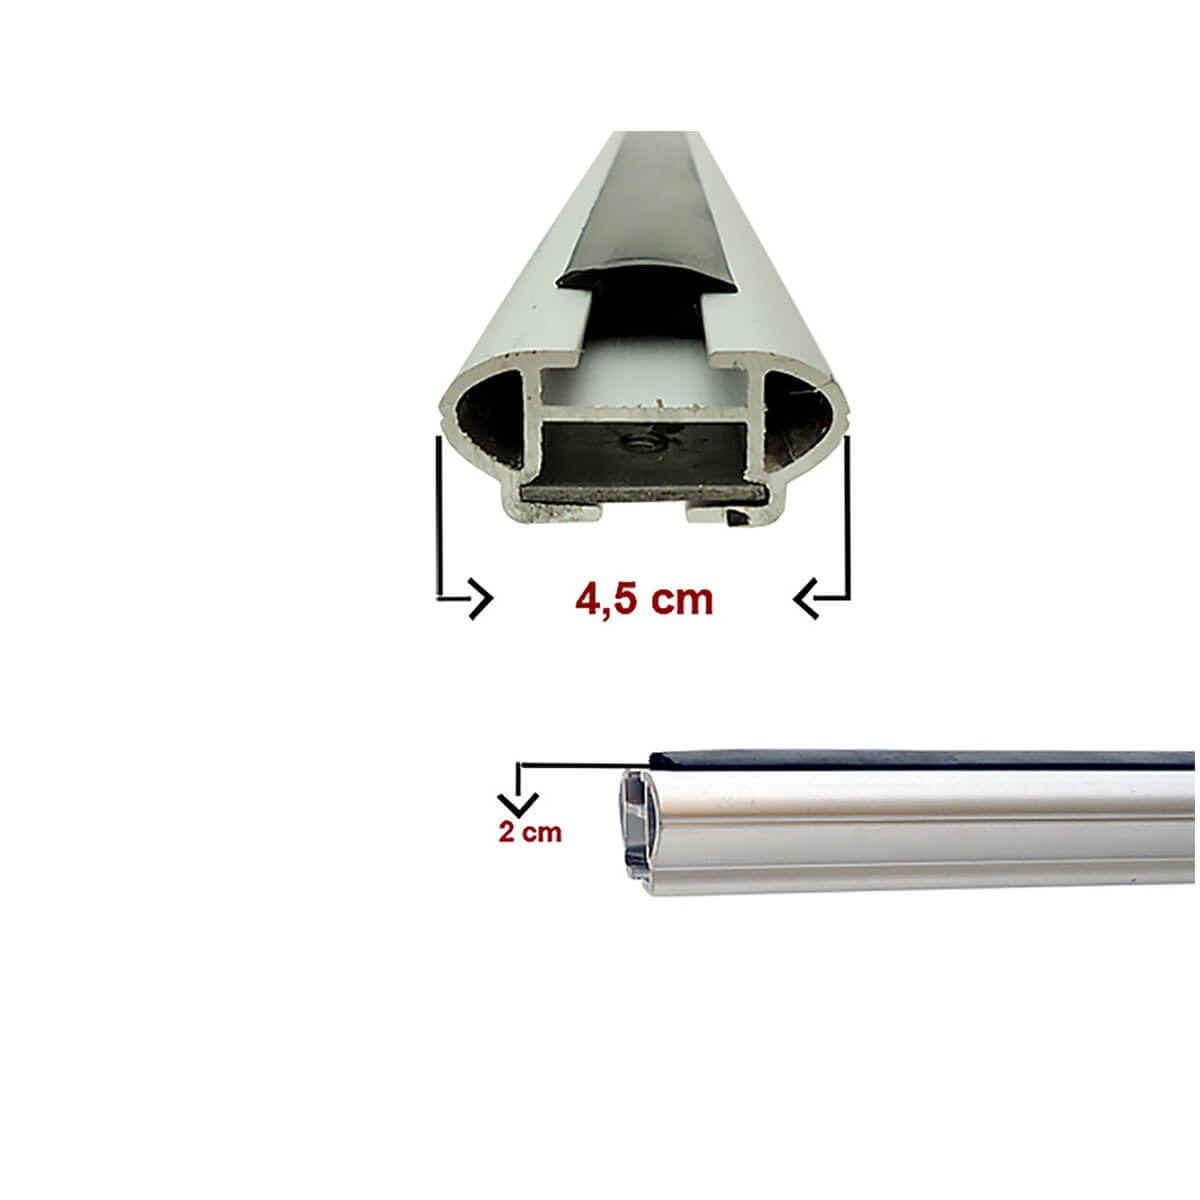 Travessa rack de teto larga alumínio Etios Cross 2013 a 2017